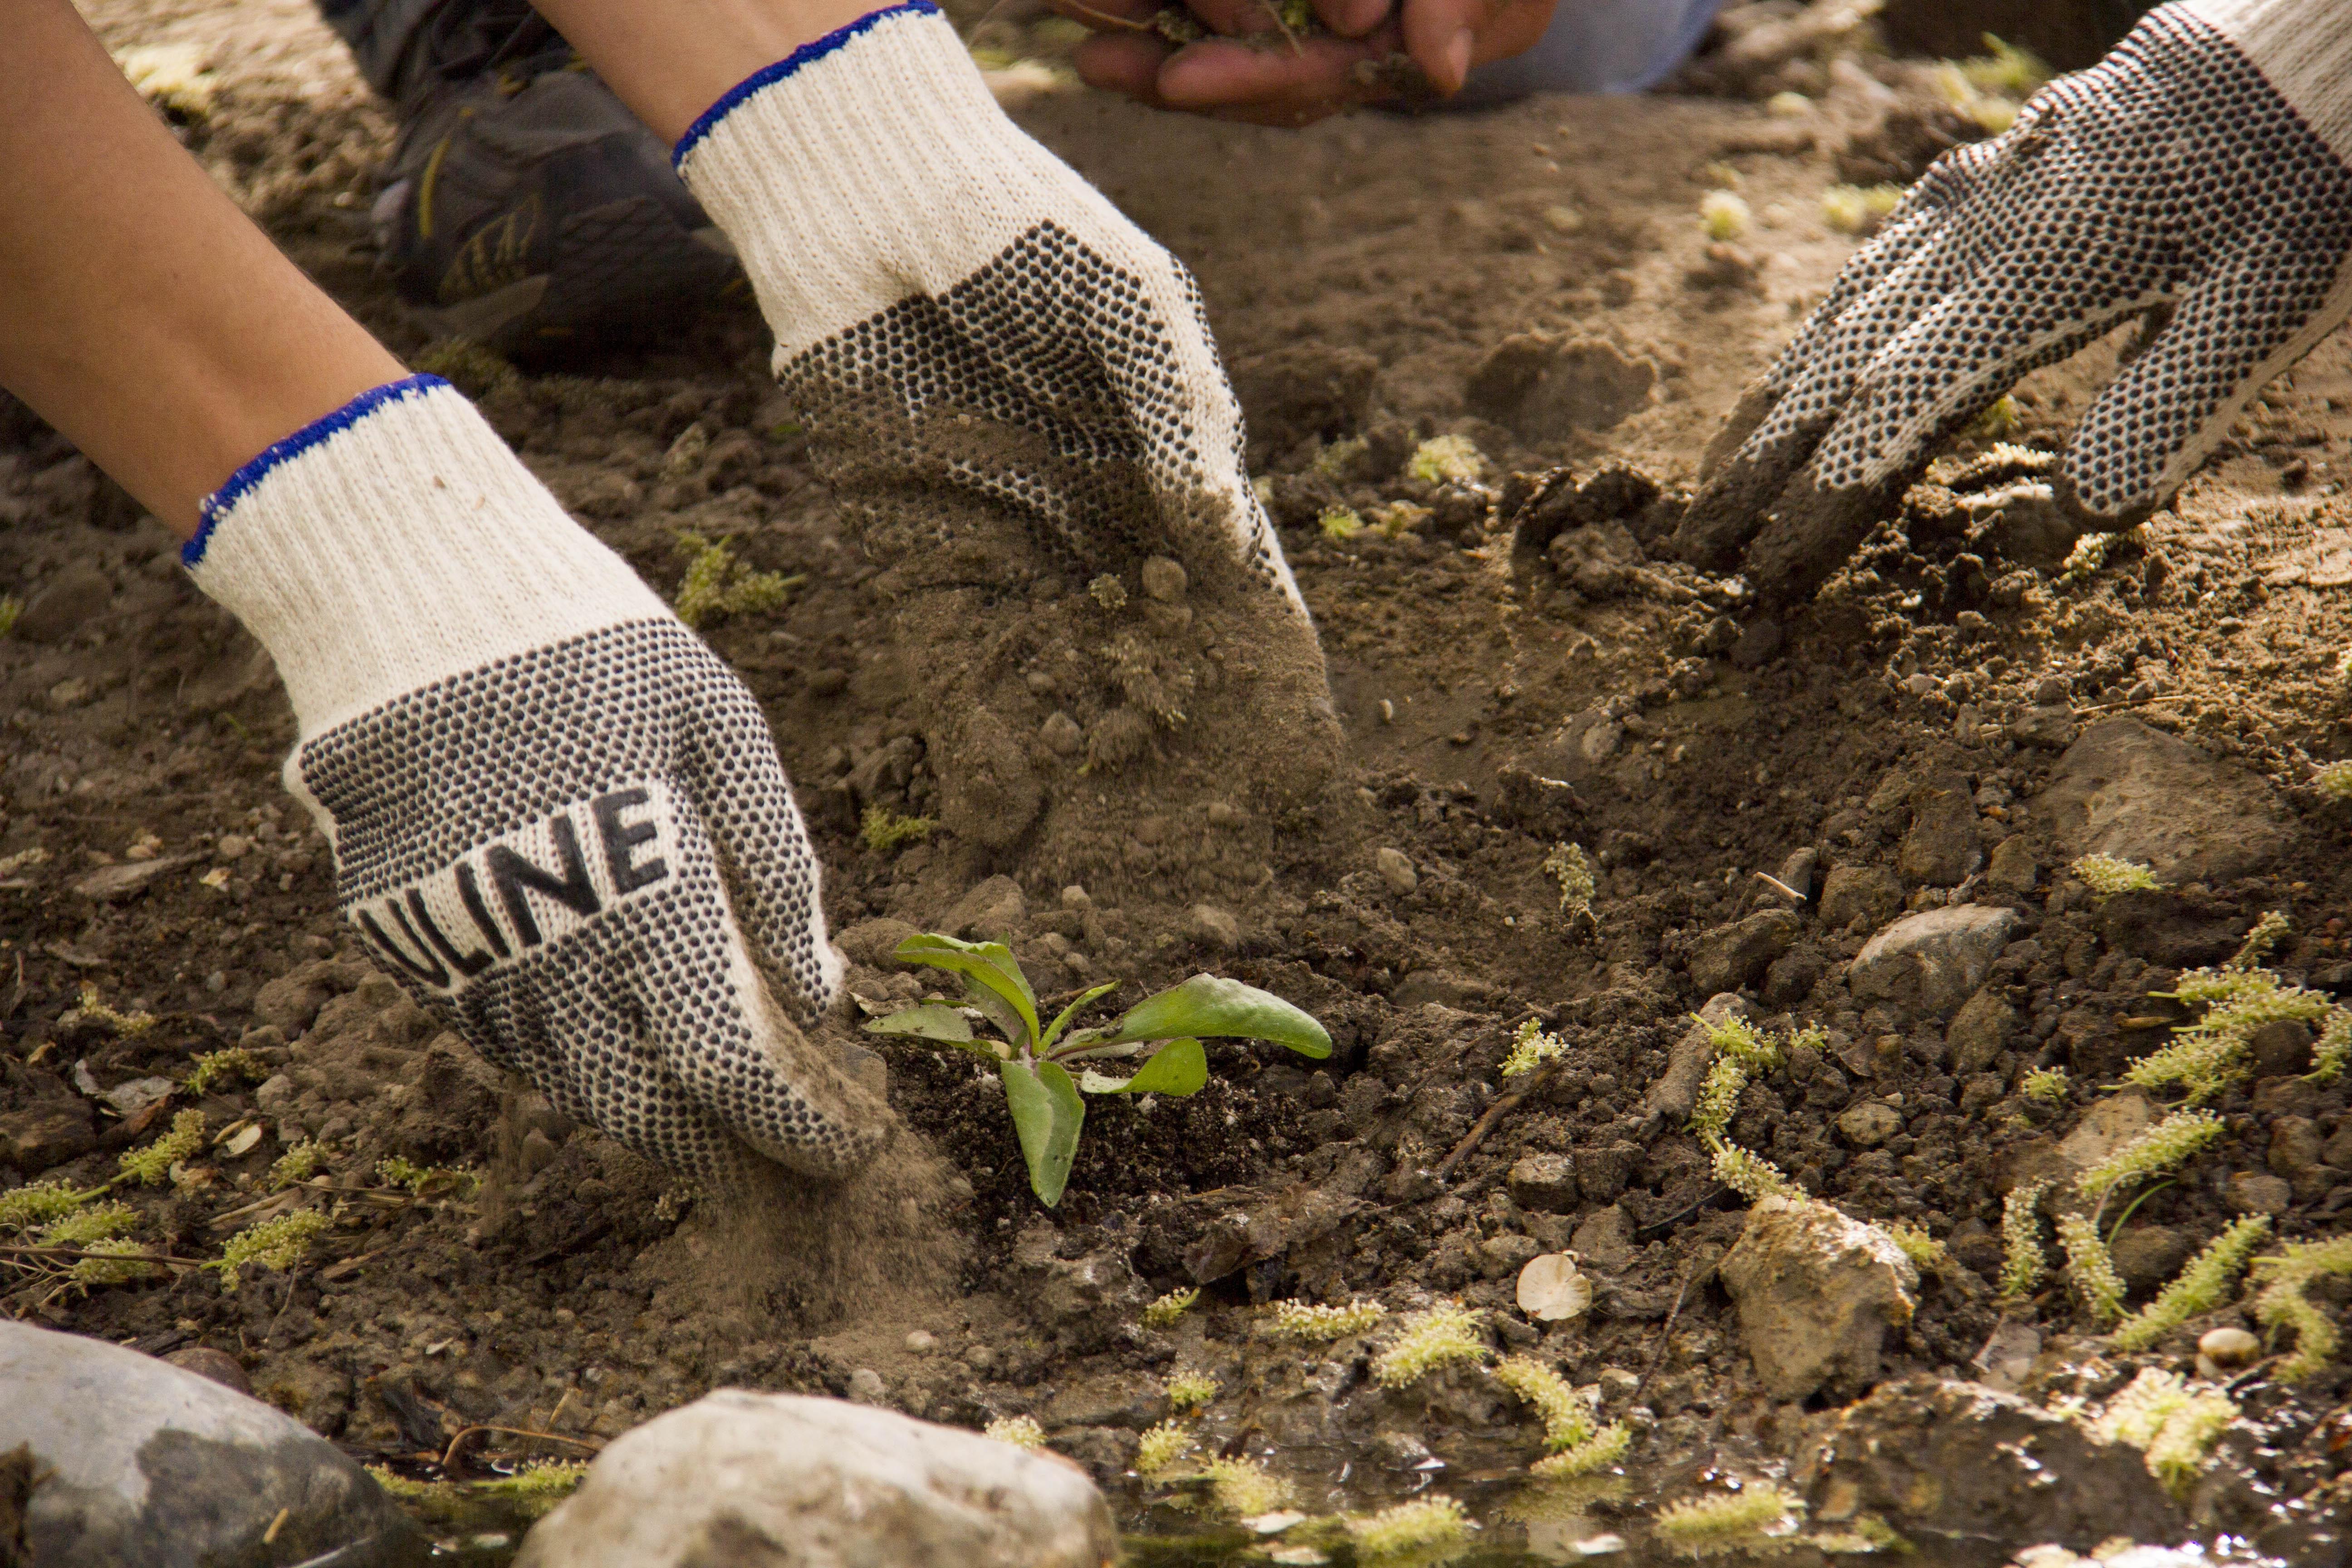 DNWR_Planting_130330_jwitt_003_low.jpg